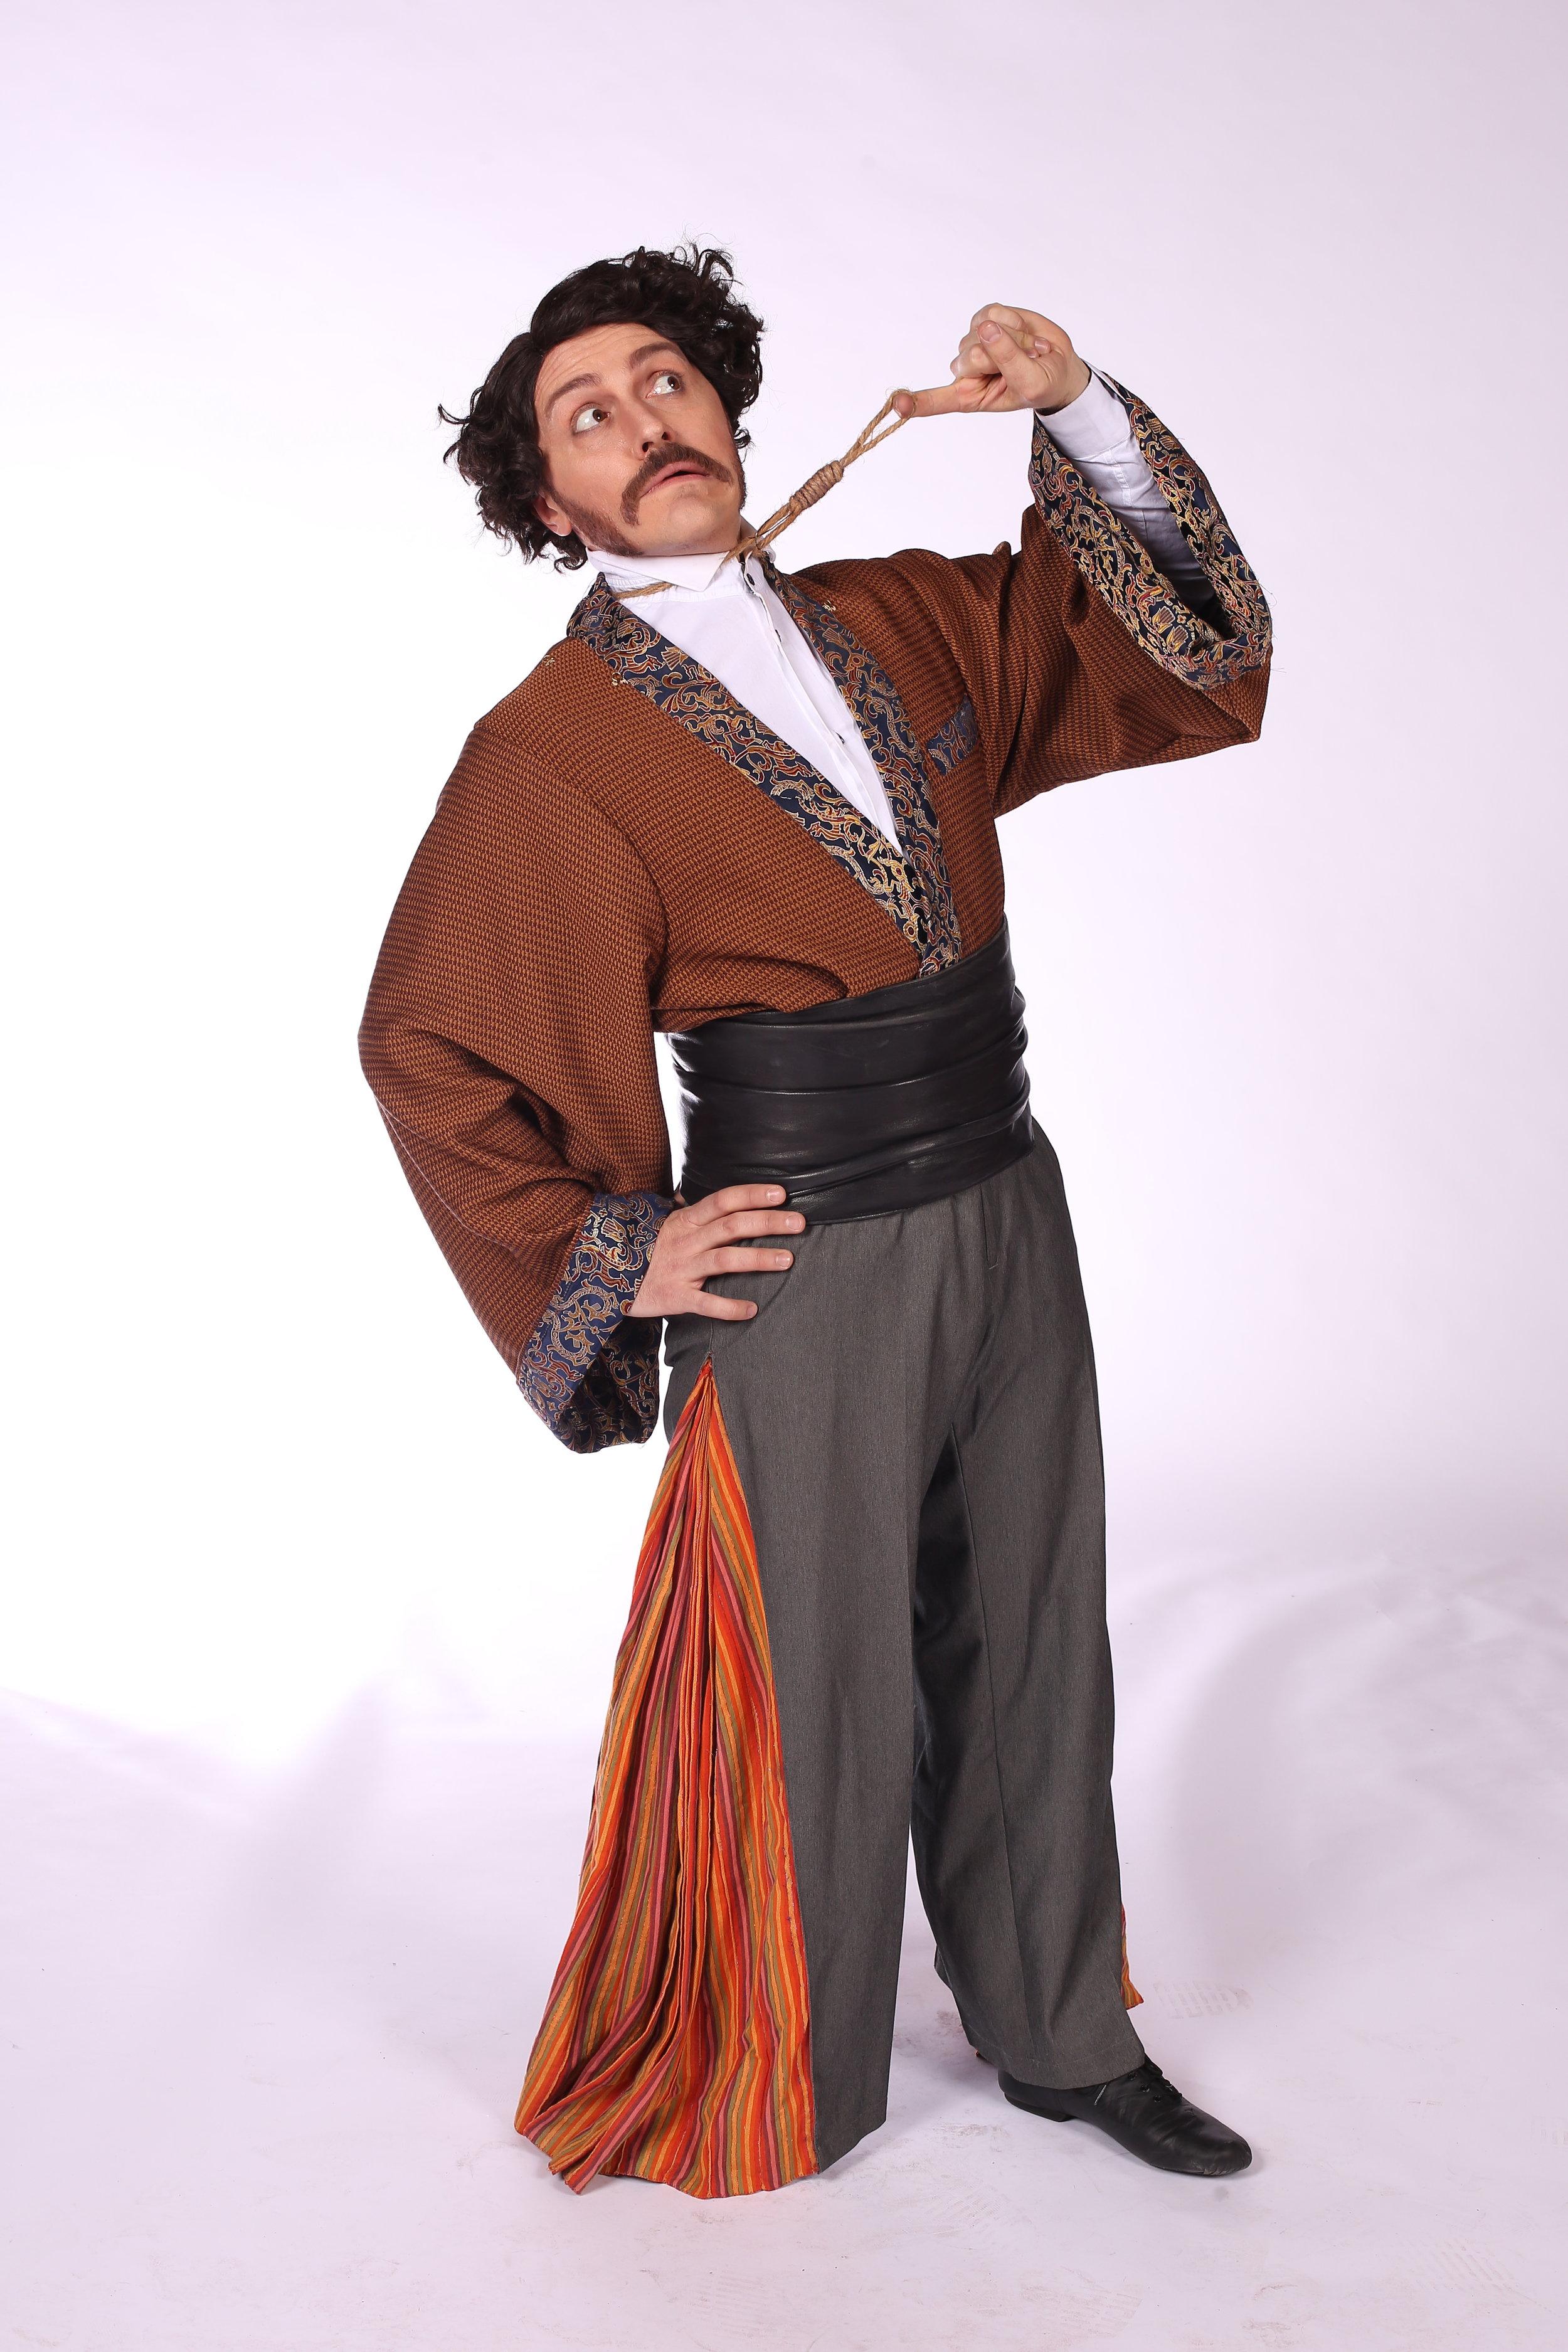 David Macaluso as Ko-Ko